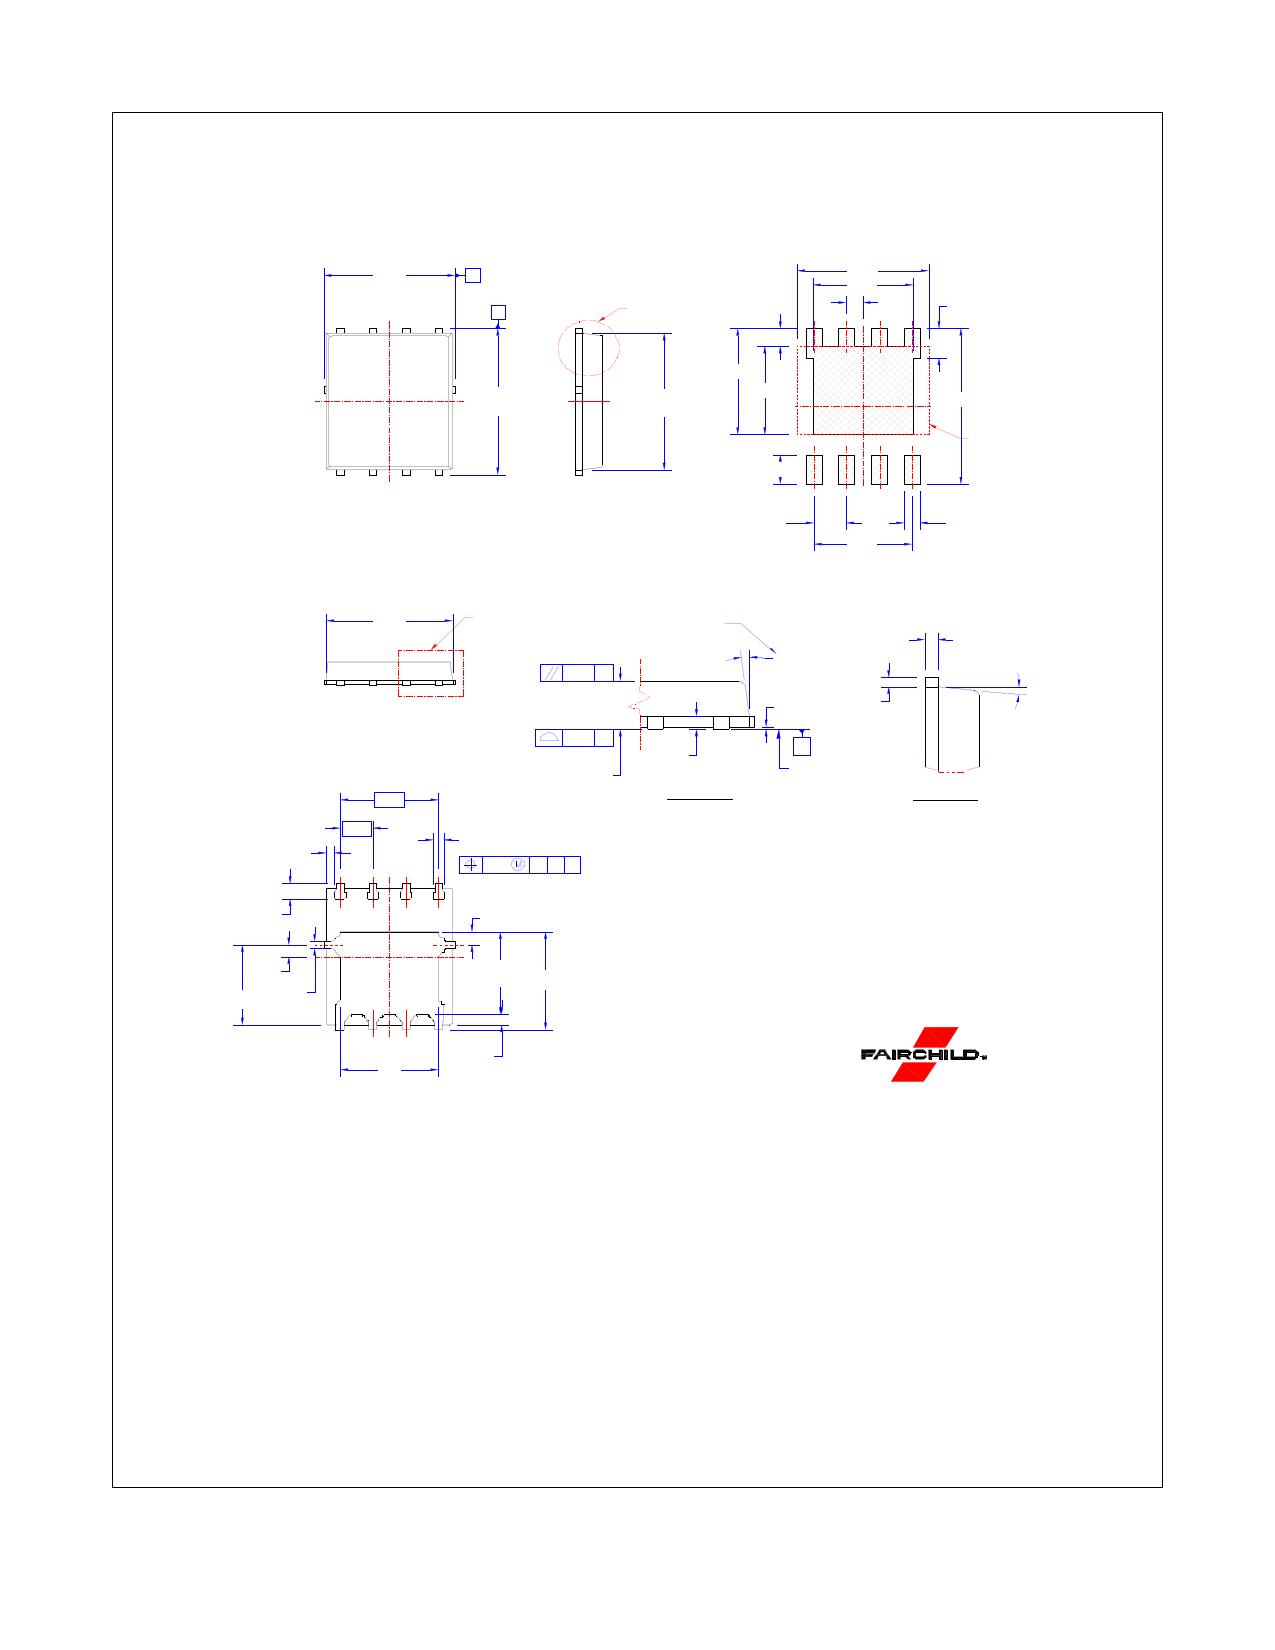 FDMS7572S 전자부품, 판매, 대치품